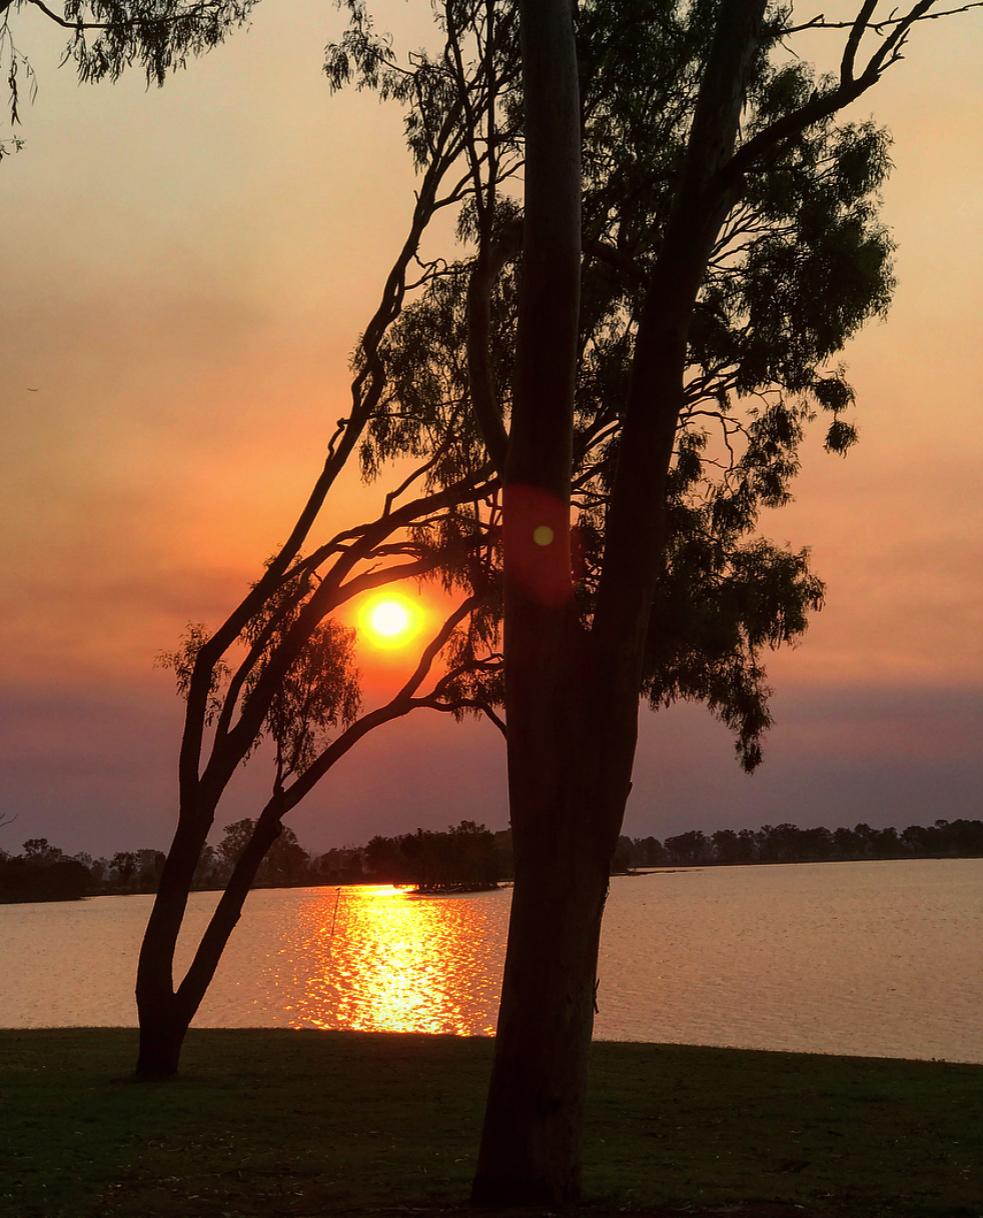 Watching the sun set at the Botanical Gardens (next to Rockhampton Zoo).